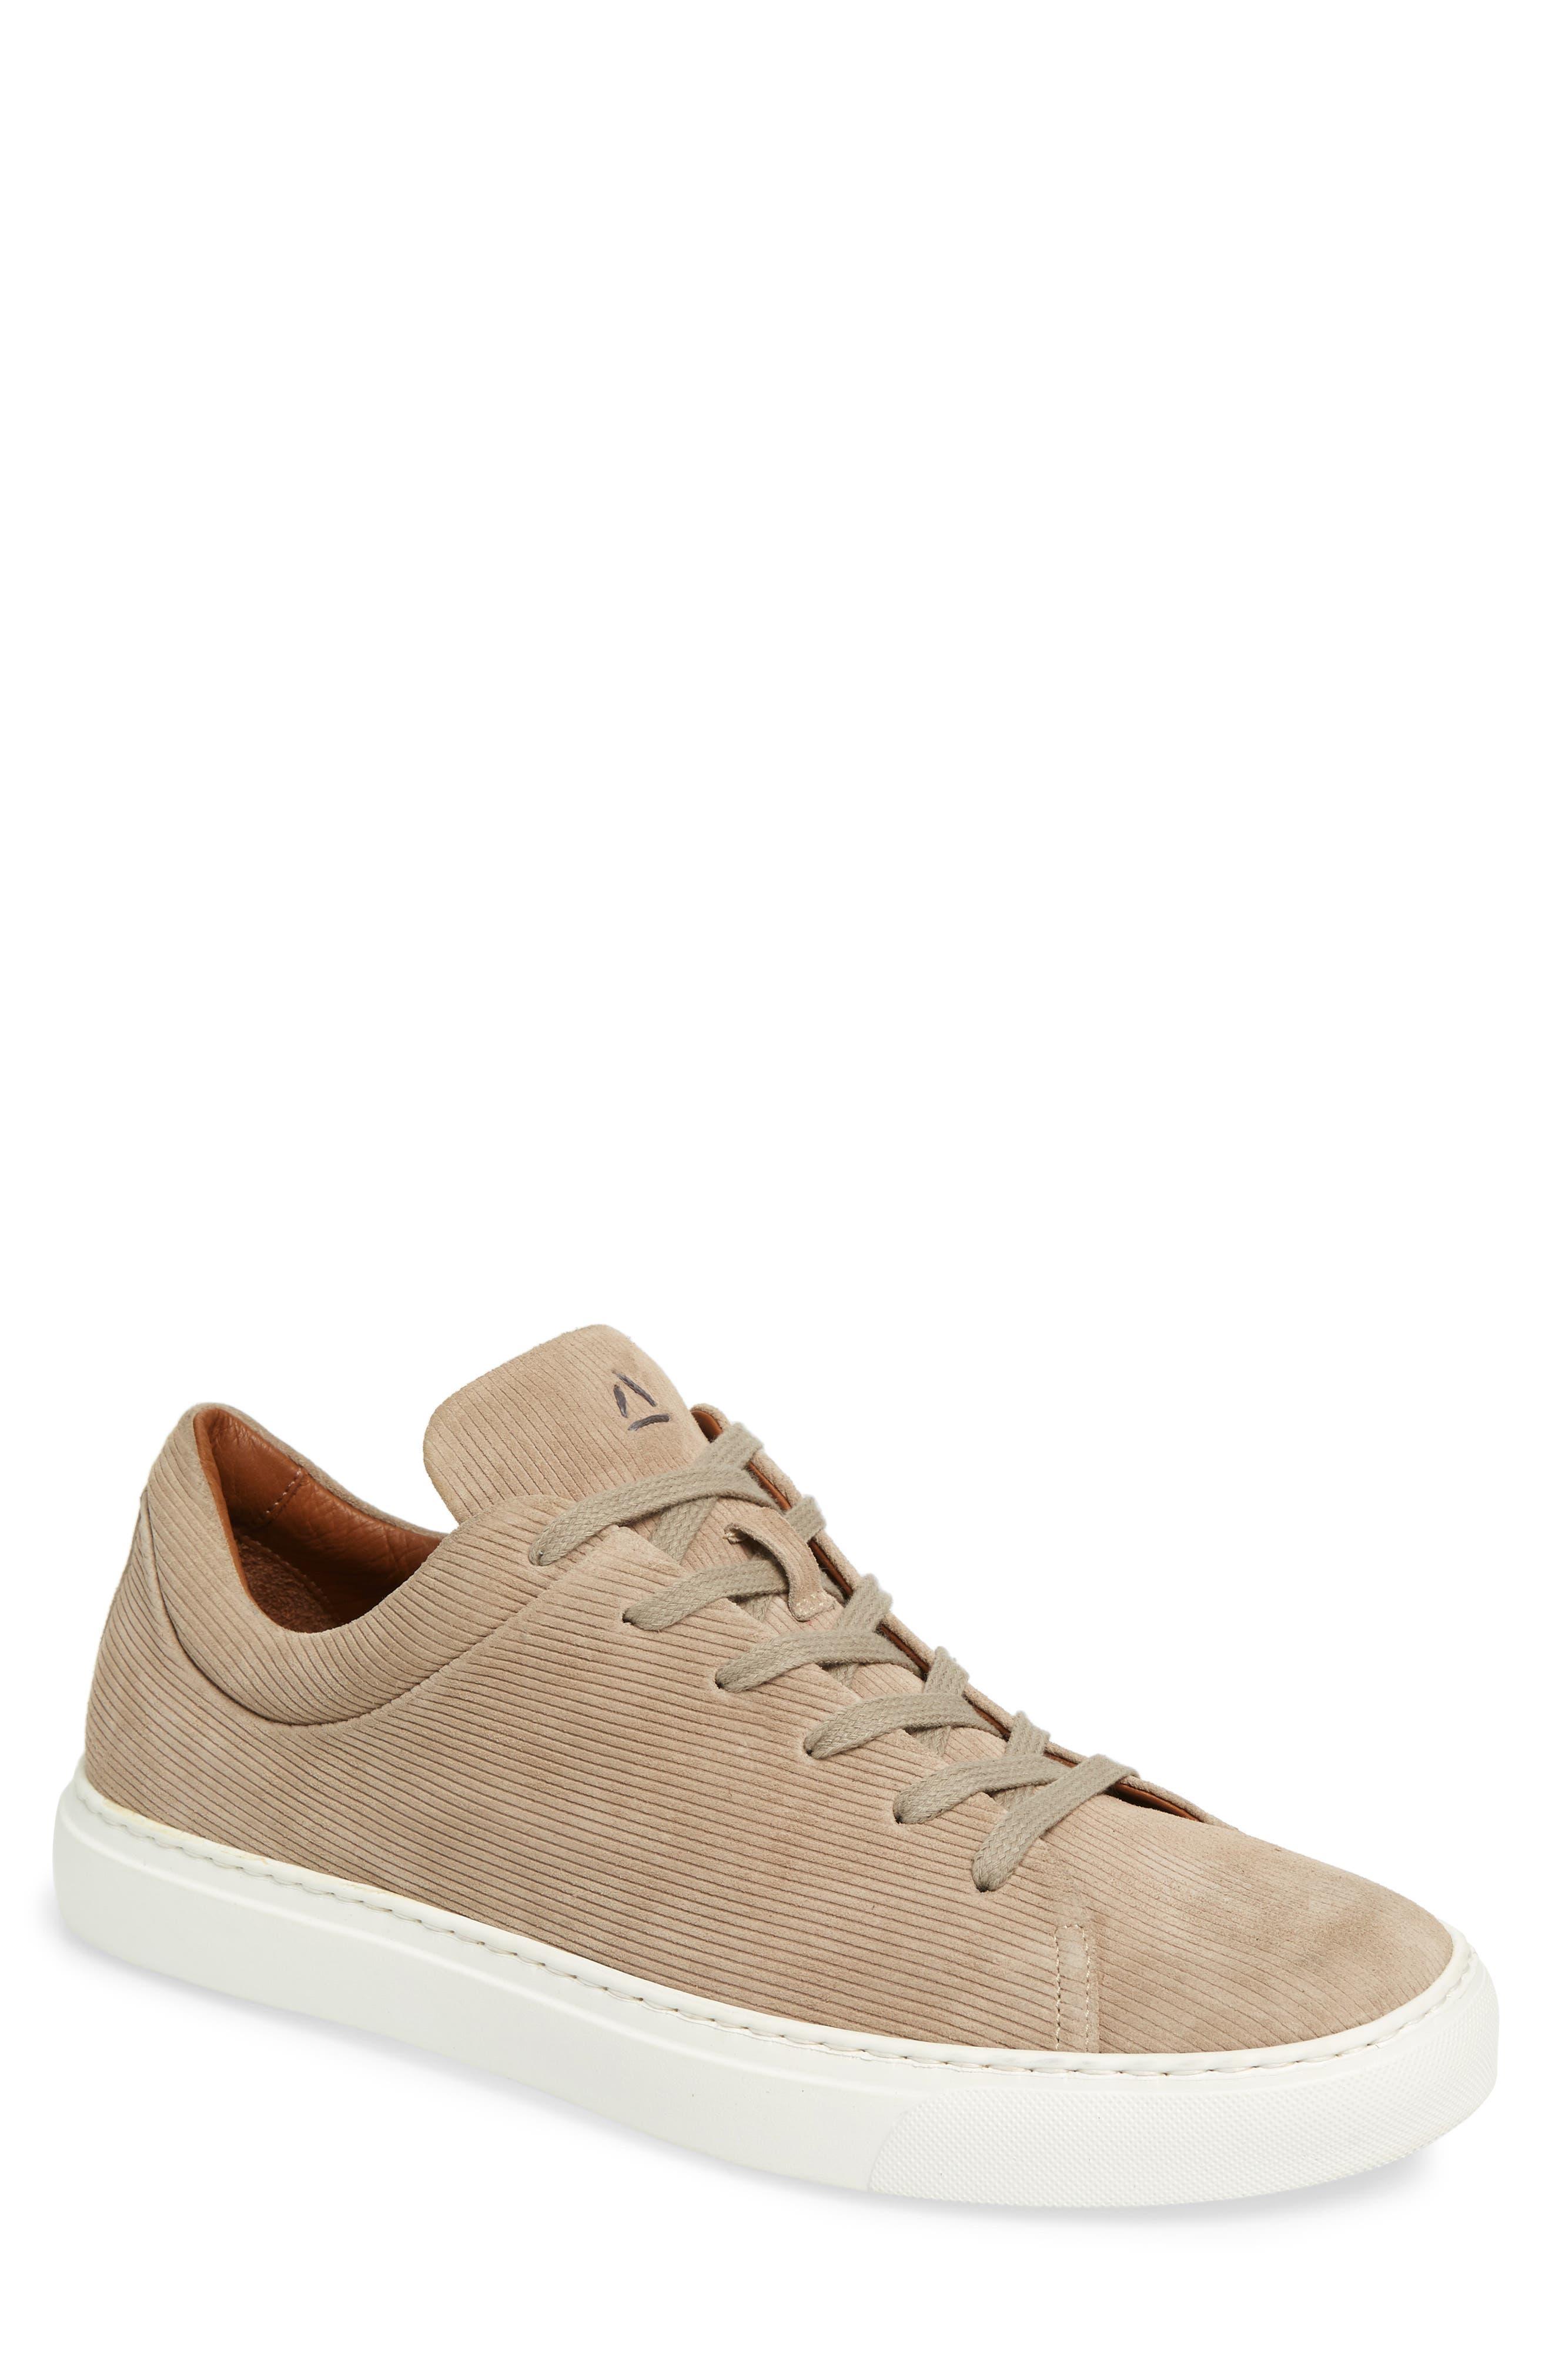 Alaric Sneaker,                             Main thumbnail 1, color,                             SAND